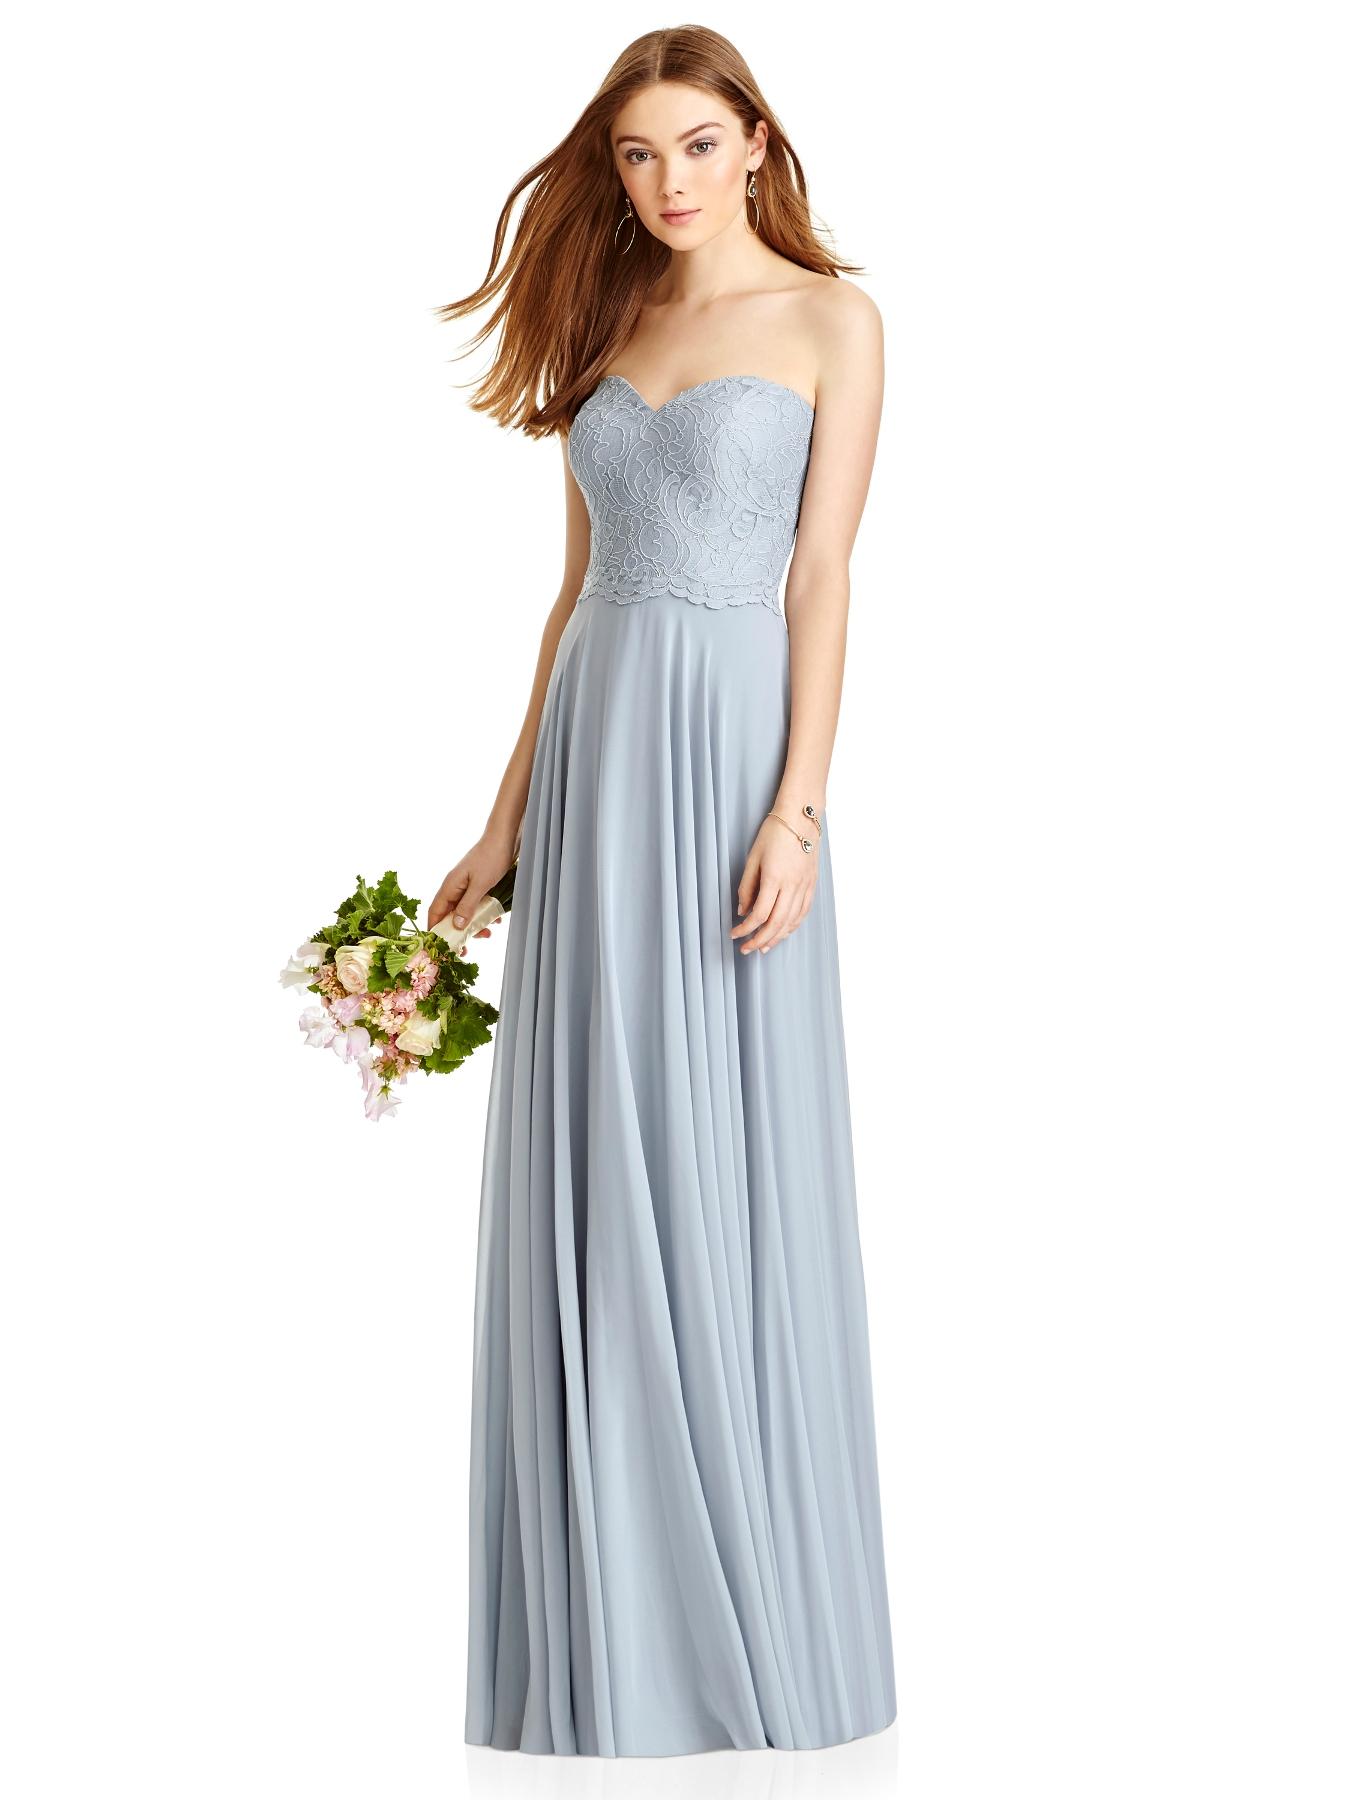 16ece06ed03 Bridesmaids Dress by Studio Design Studio Design Bridesmaids SPRING 2017 -  4504 - fabric  Lux Chiffon